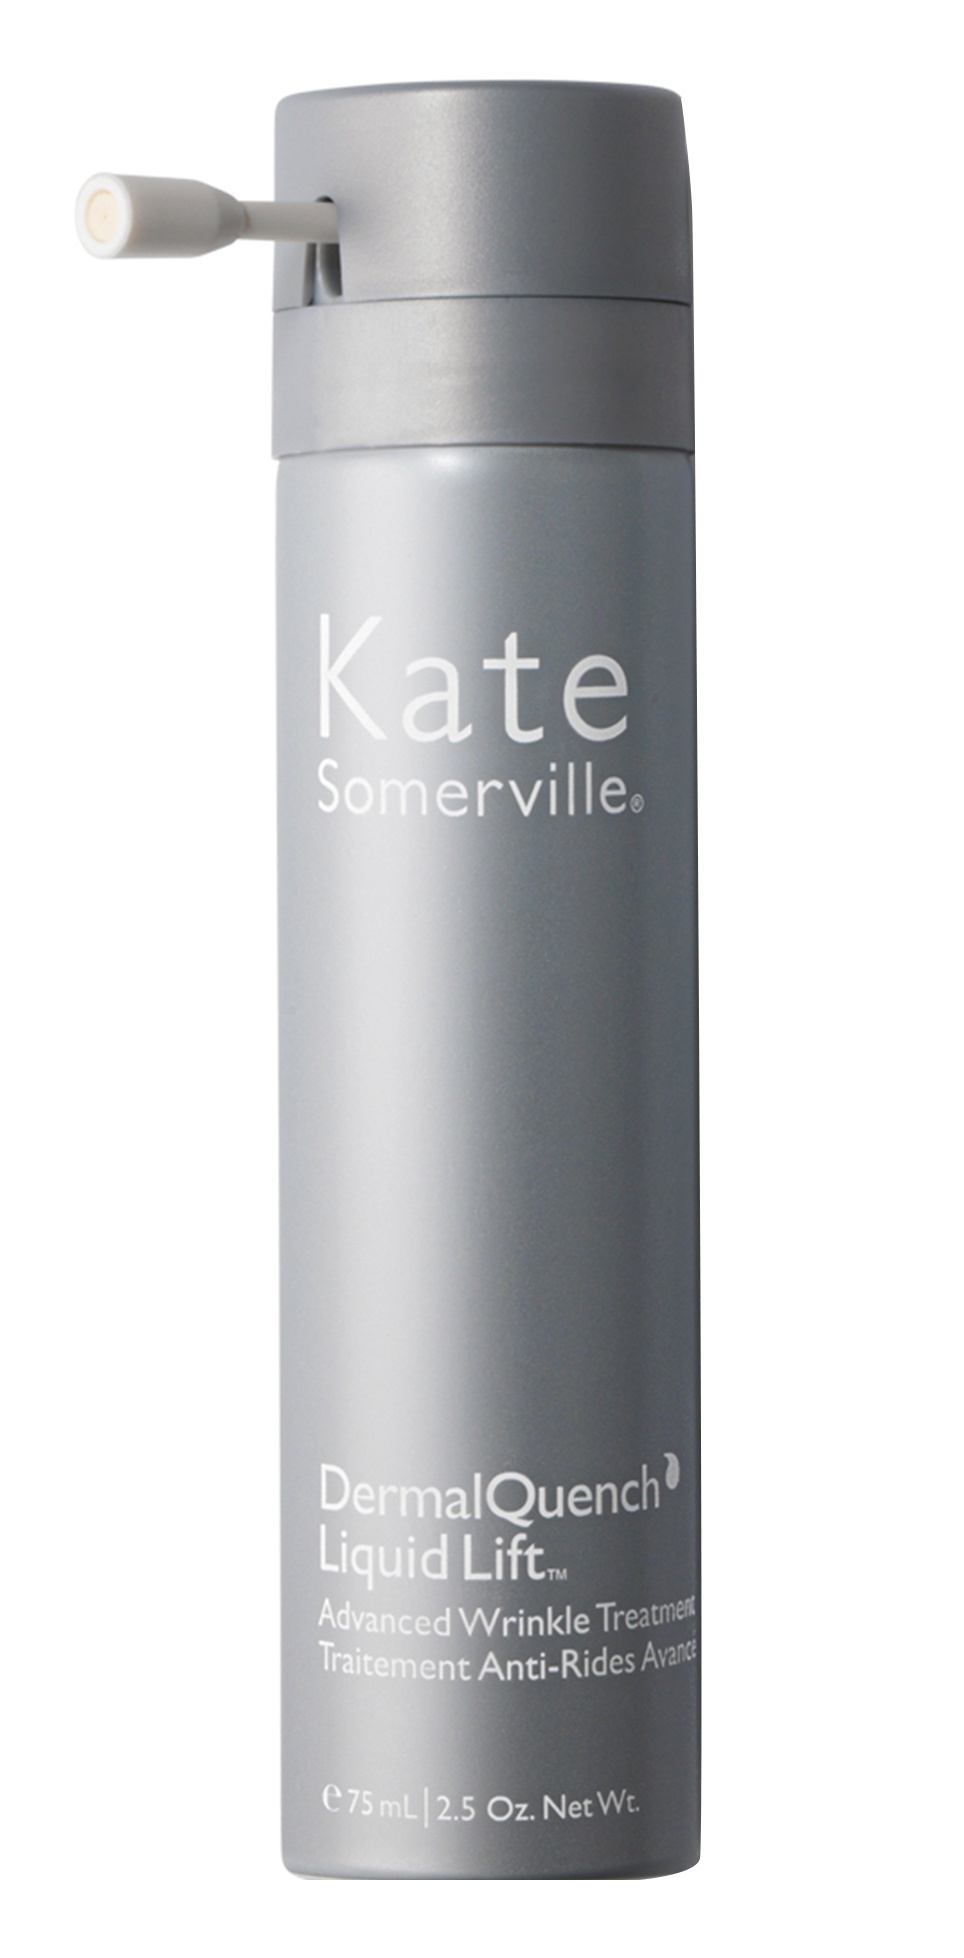 Kate Somerville Dermalquench Liquid Lift Advanced Hydration Treatment